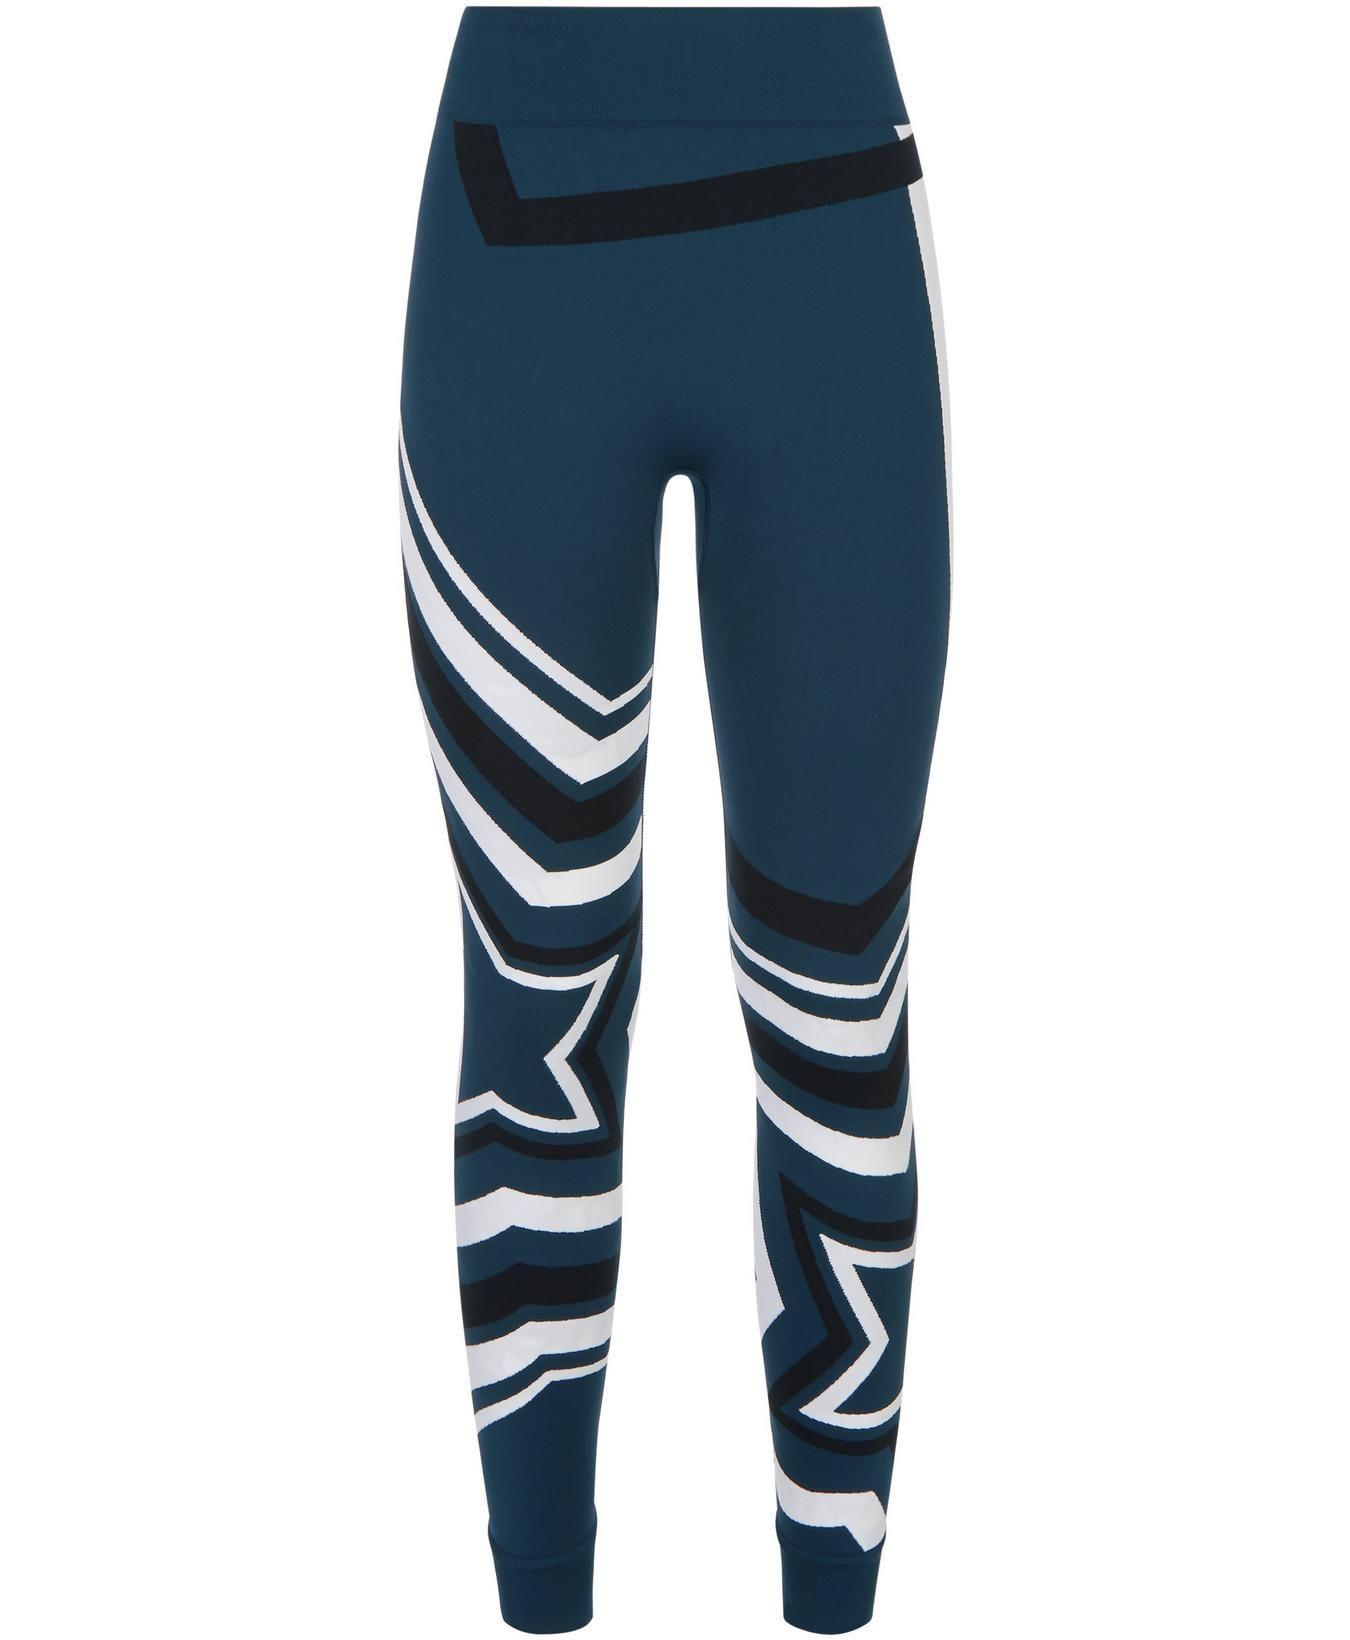 45d4a62086e7f Festive Star Seamless Base Layers Leggings - Beetle Blue Star Jacquard    Women's Leggings   Sweaty Betty